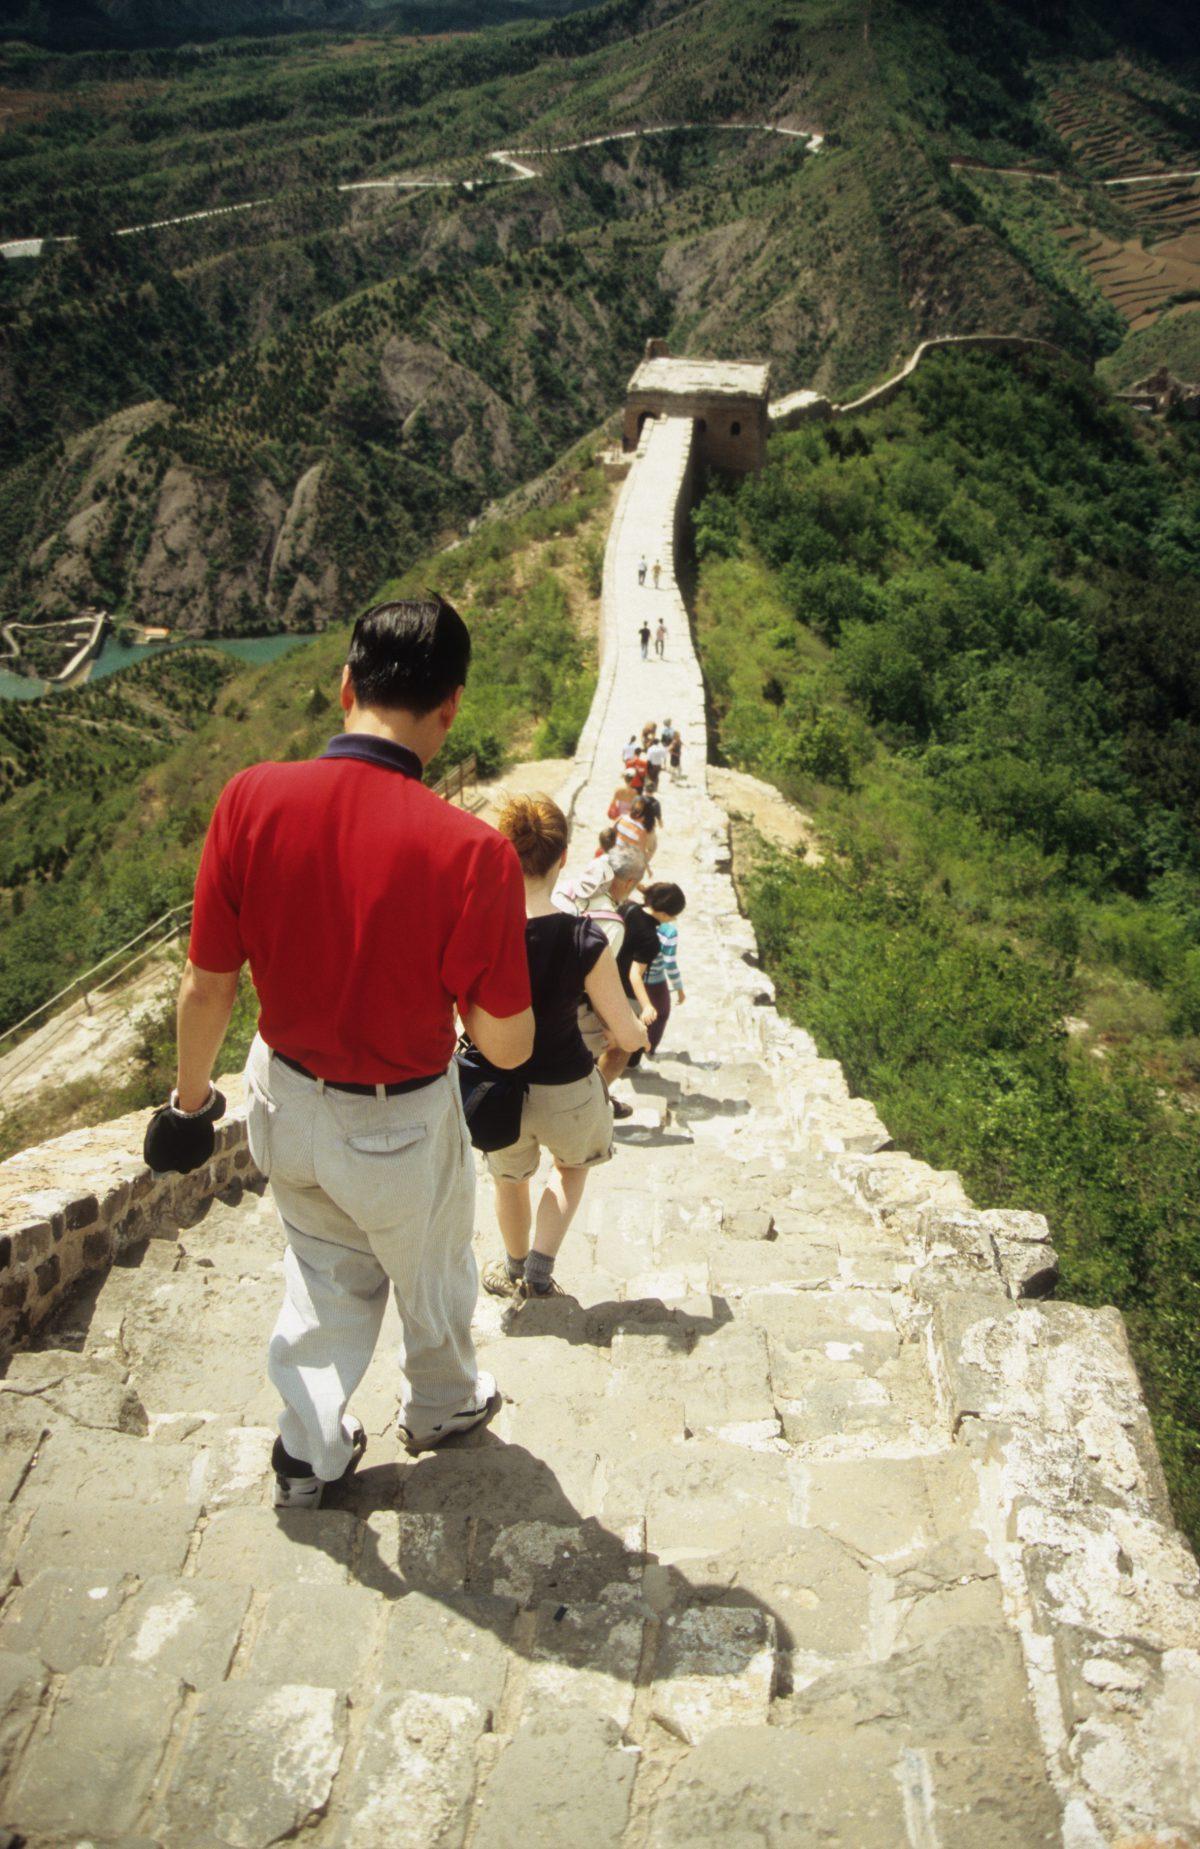 Descent - Great Wall at Simatai, landmark, people, walk